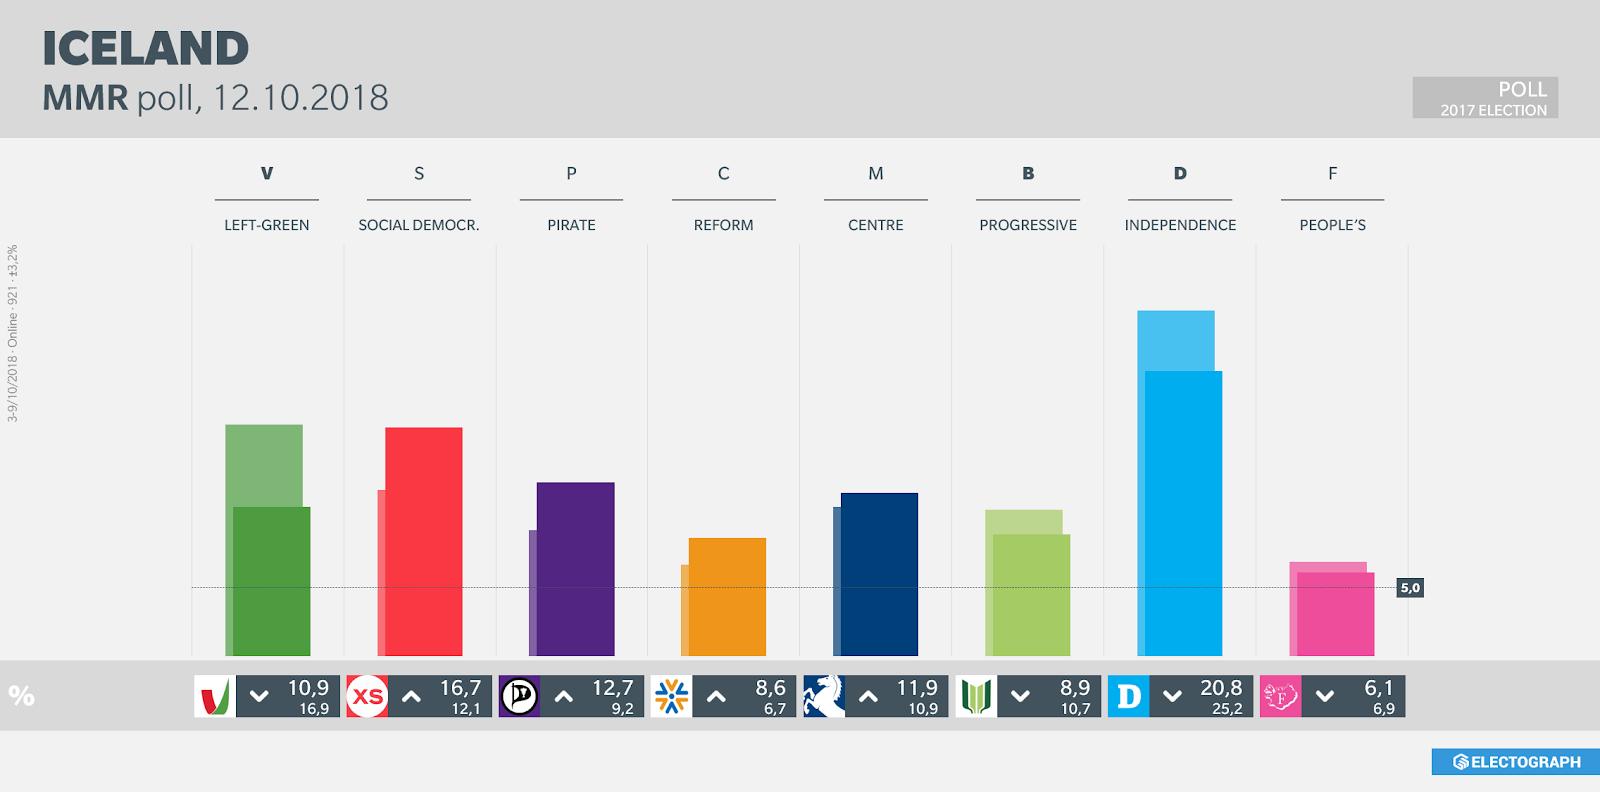 ICELAND: MMR poll chart, October 2018